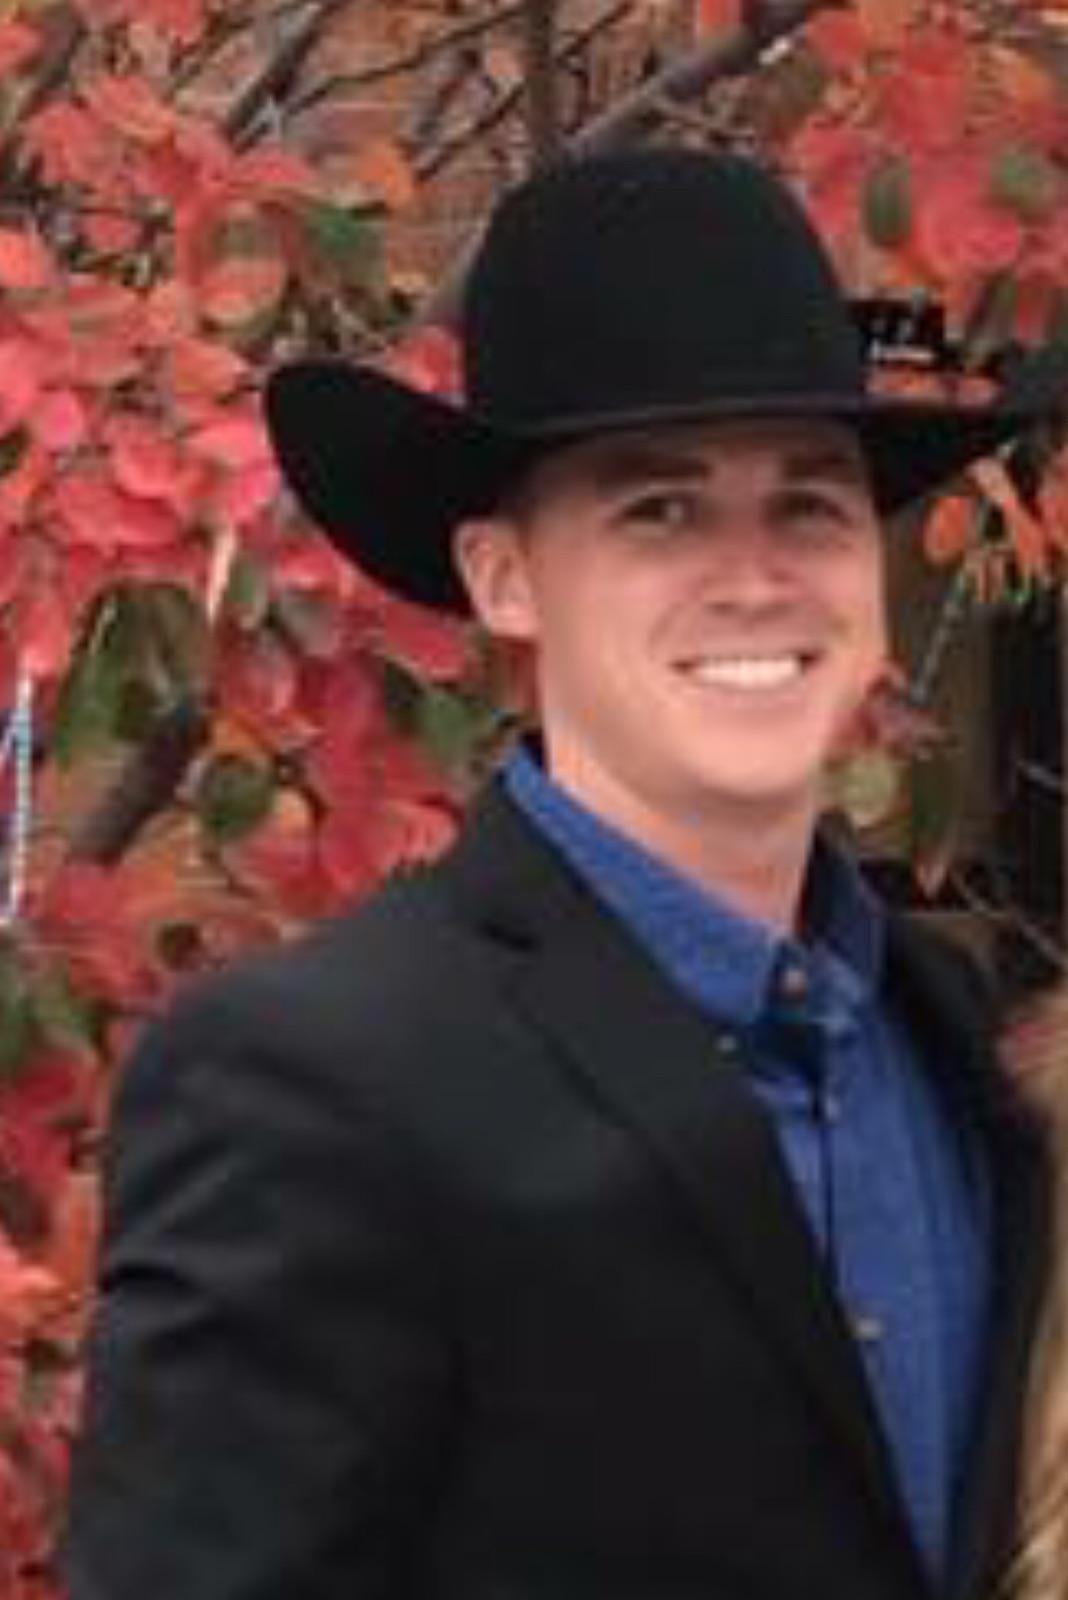 Army career segues into rodeo bullfighting run for Iowan ...